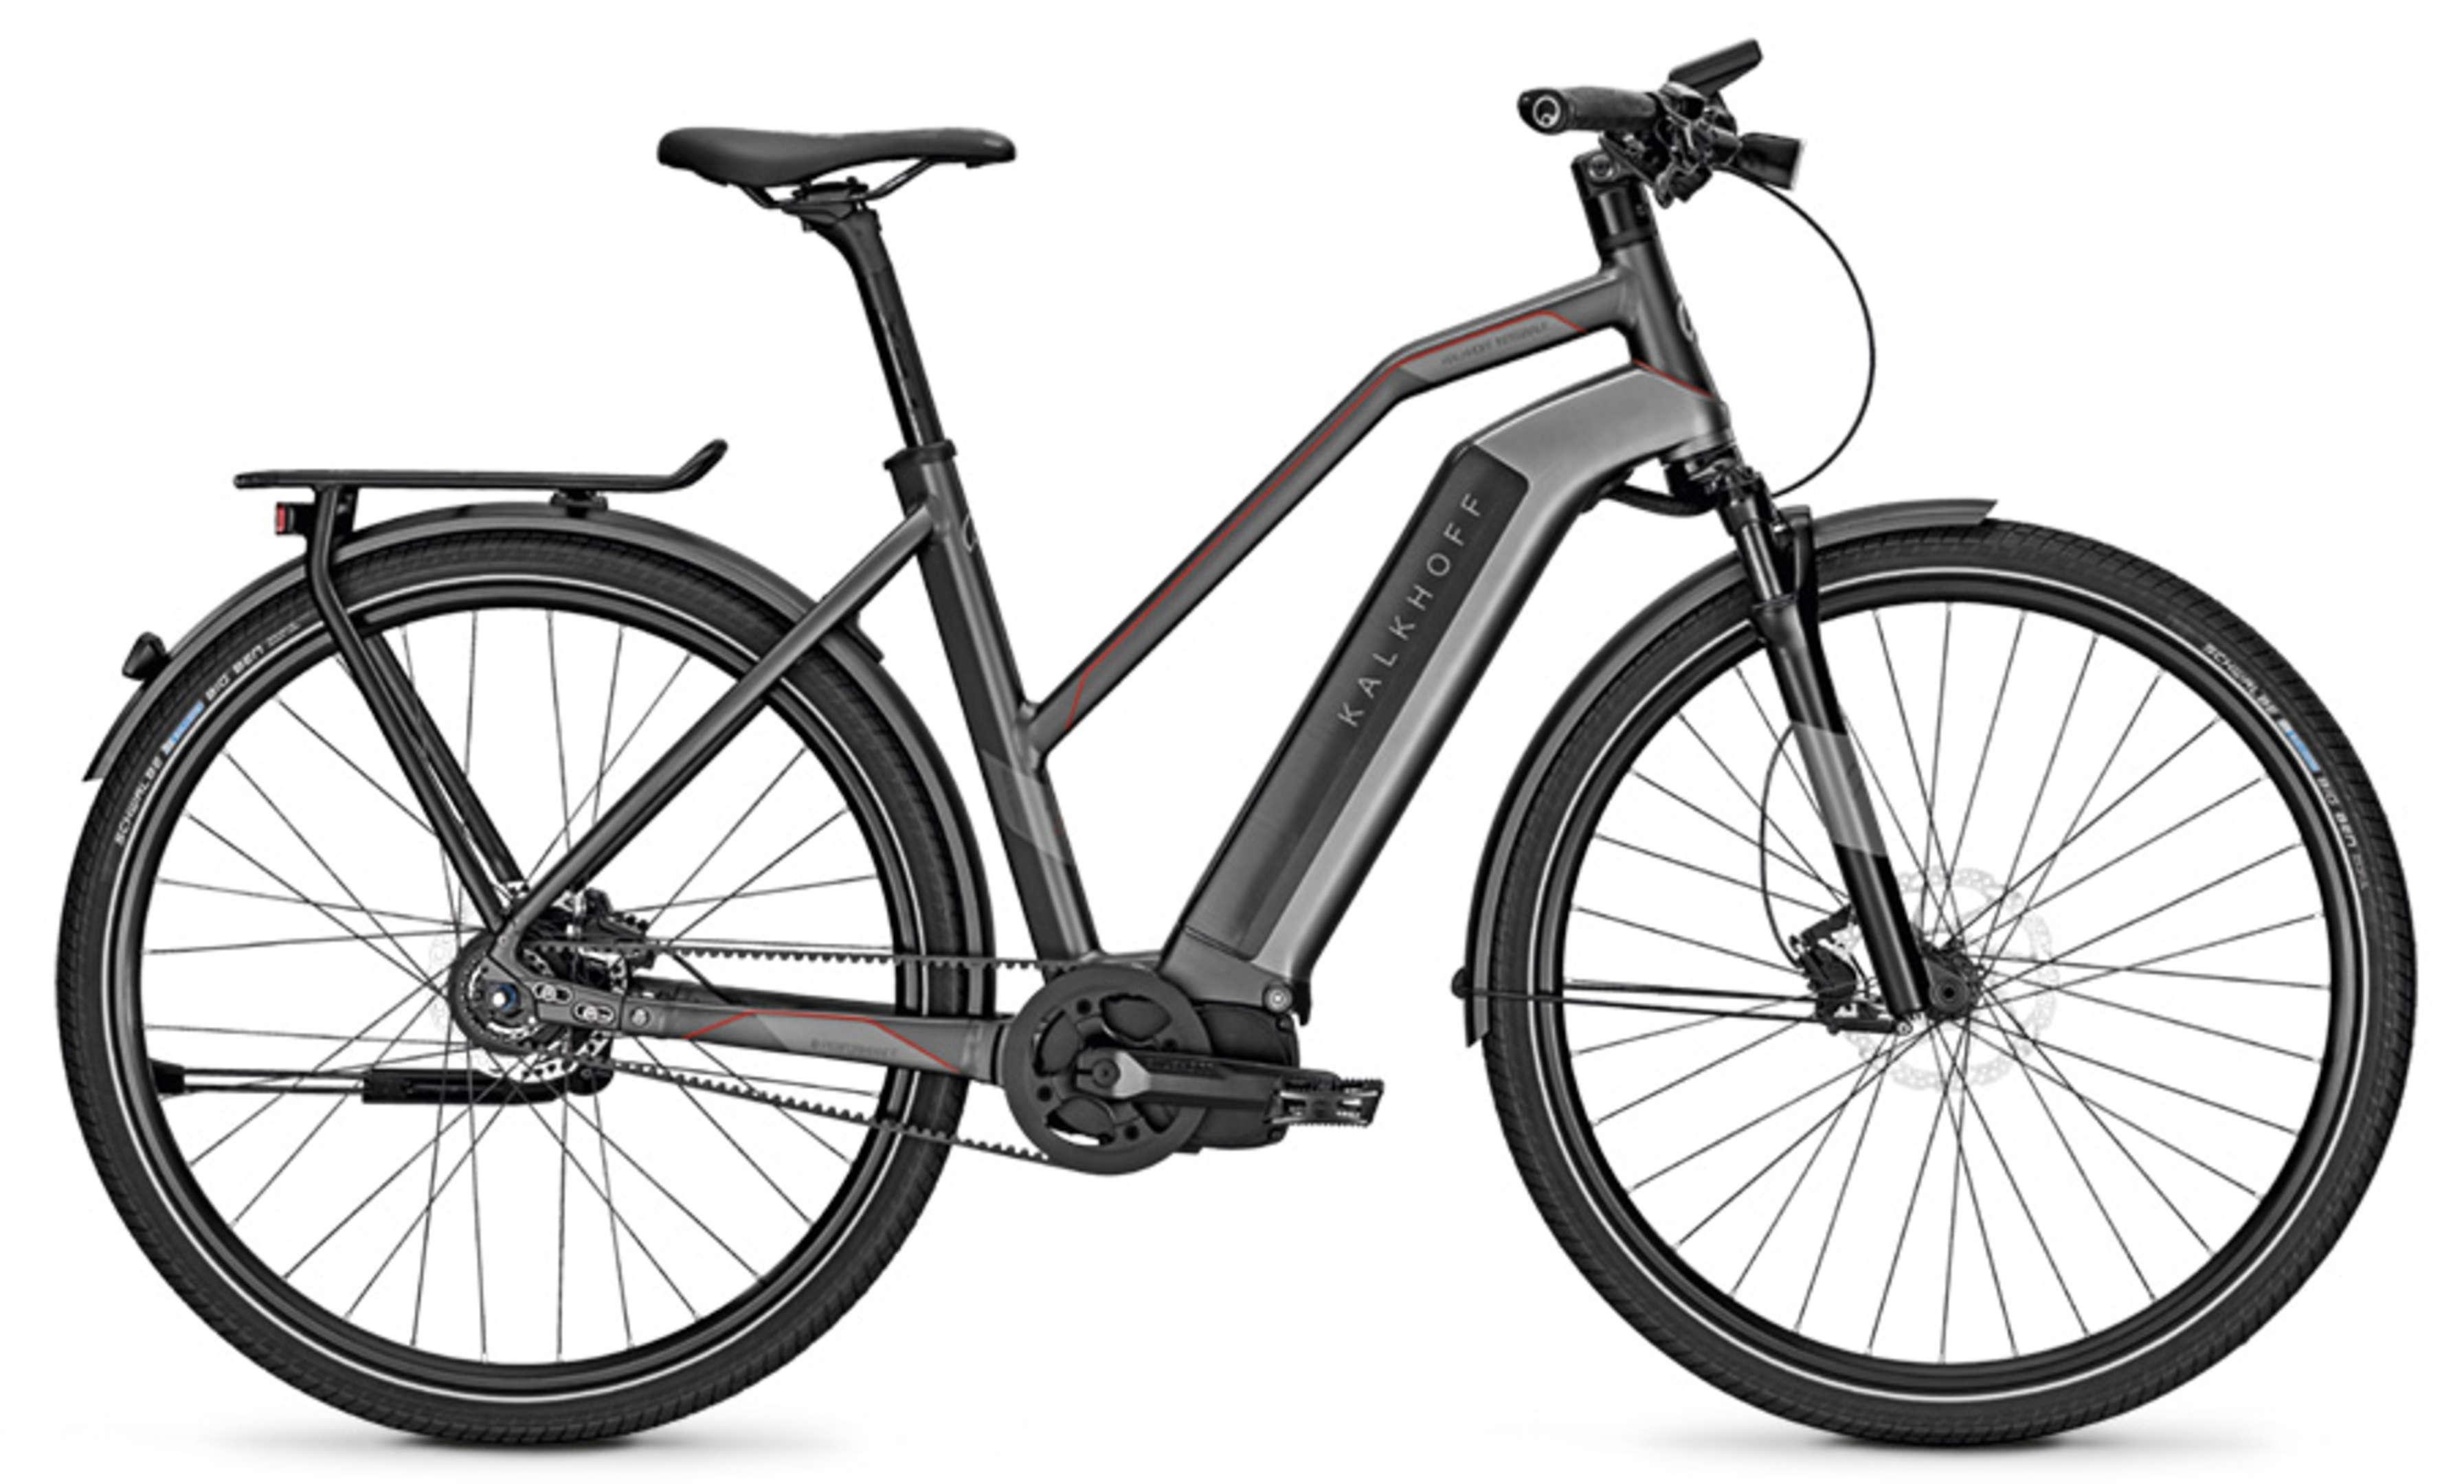 kalkhoff e bike integrale i8 eurorad bikeleasingeurorad bikeleasing. Black Bedroom Furniture Sets. Home Design Ideas